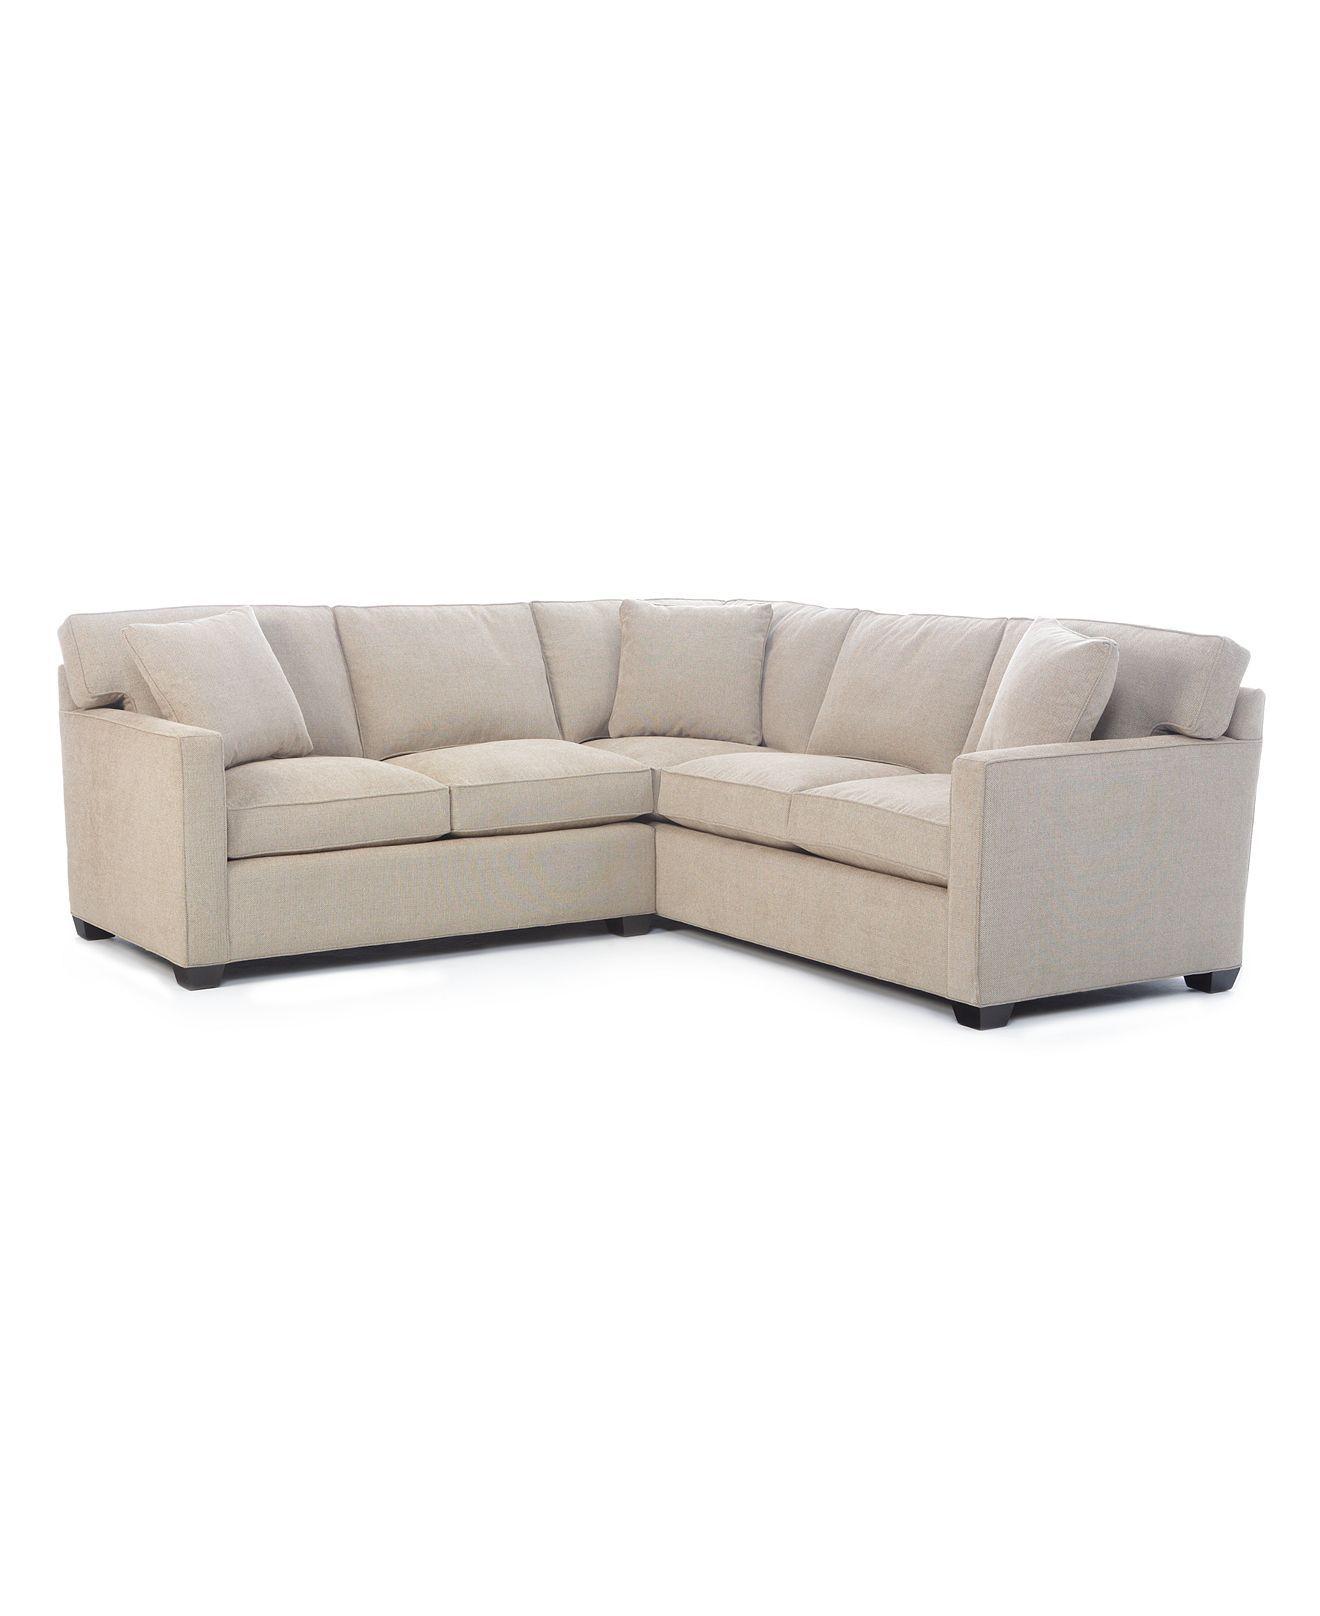 houzz sofas rattan garden furniture cube sofa dining set including parasol elegant gray sectional